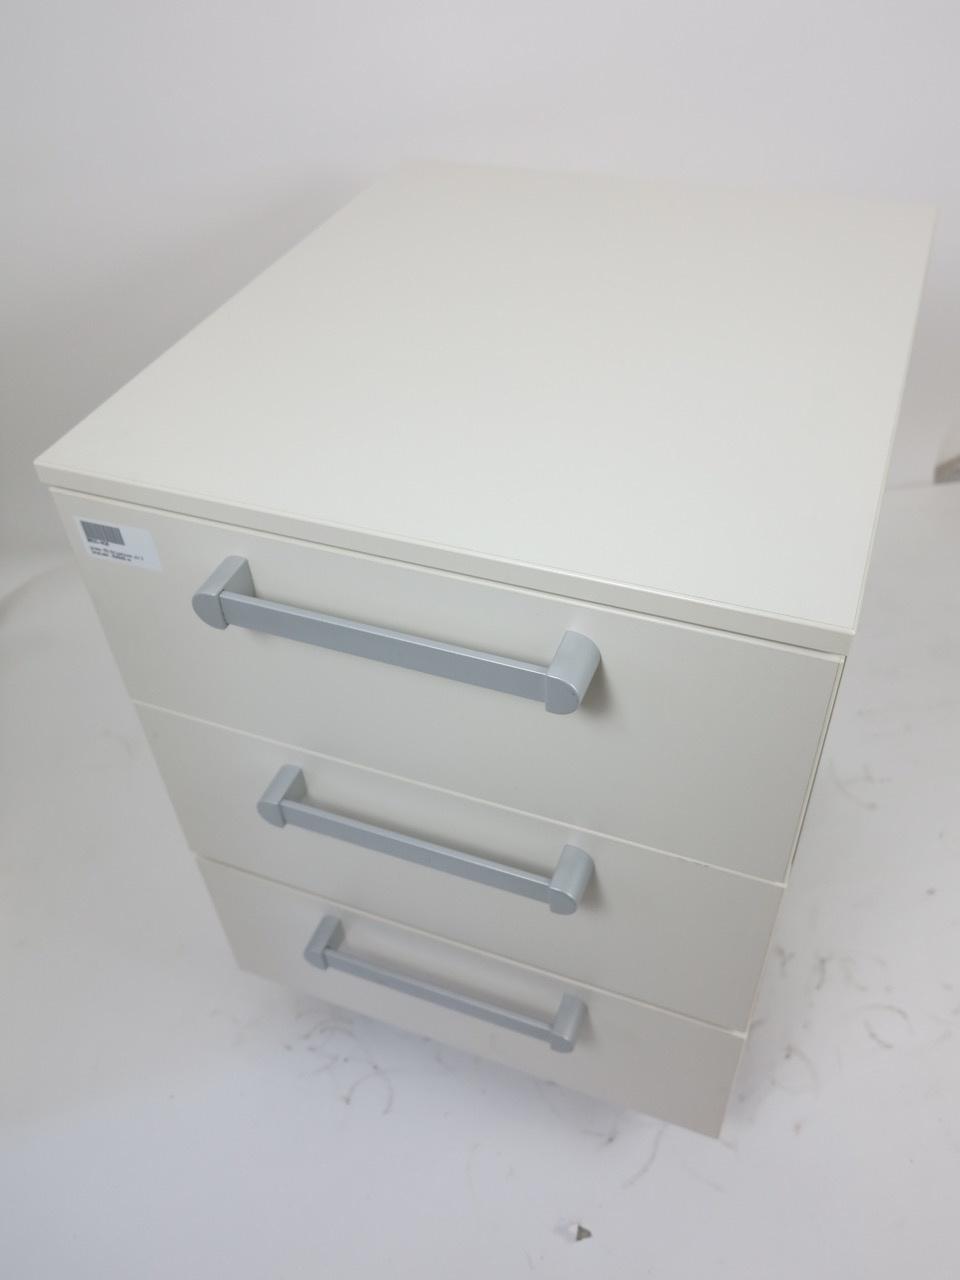 Waldner Waldner MC6 labor cabinet, 3 drawers, 45 cm width, 64cm heigth, 50cm depht